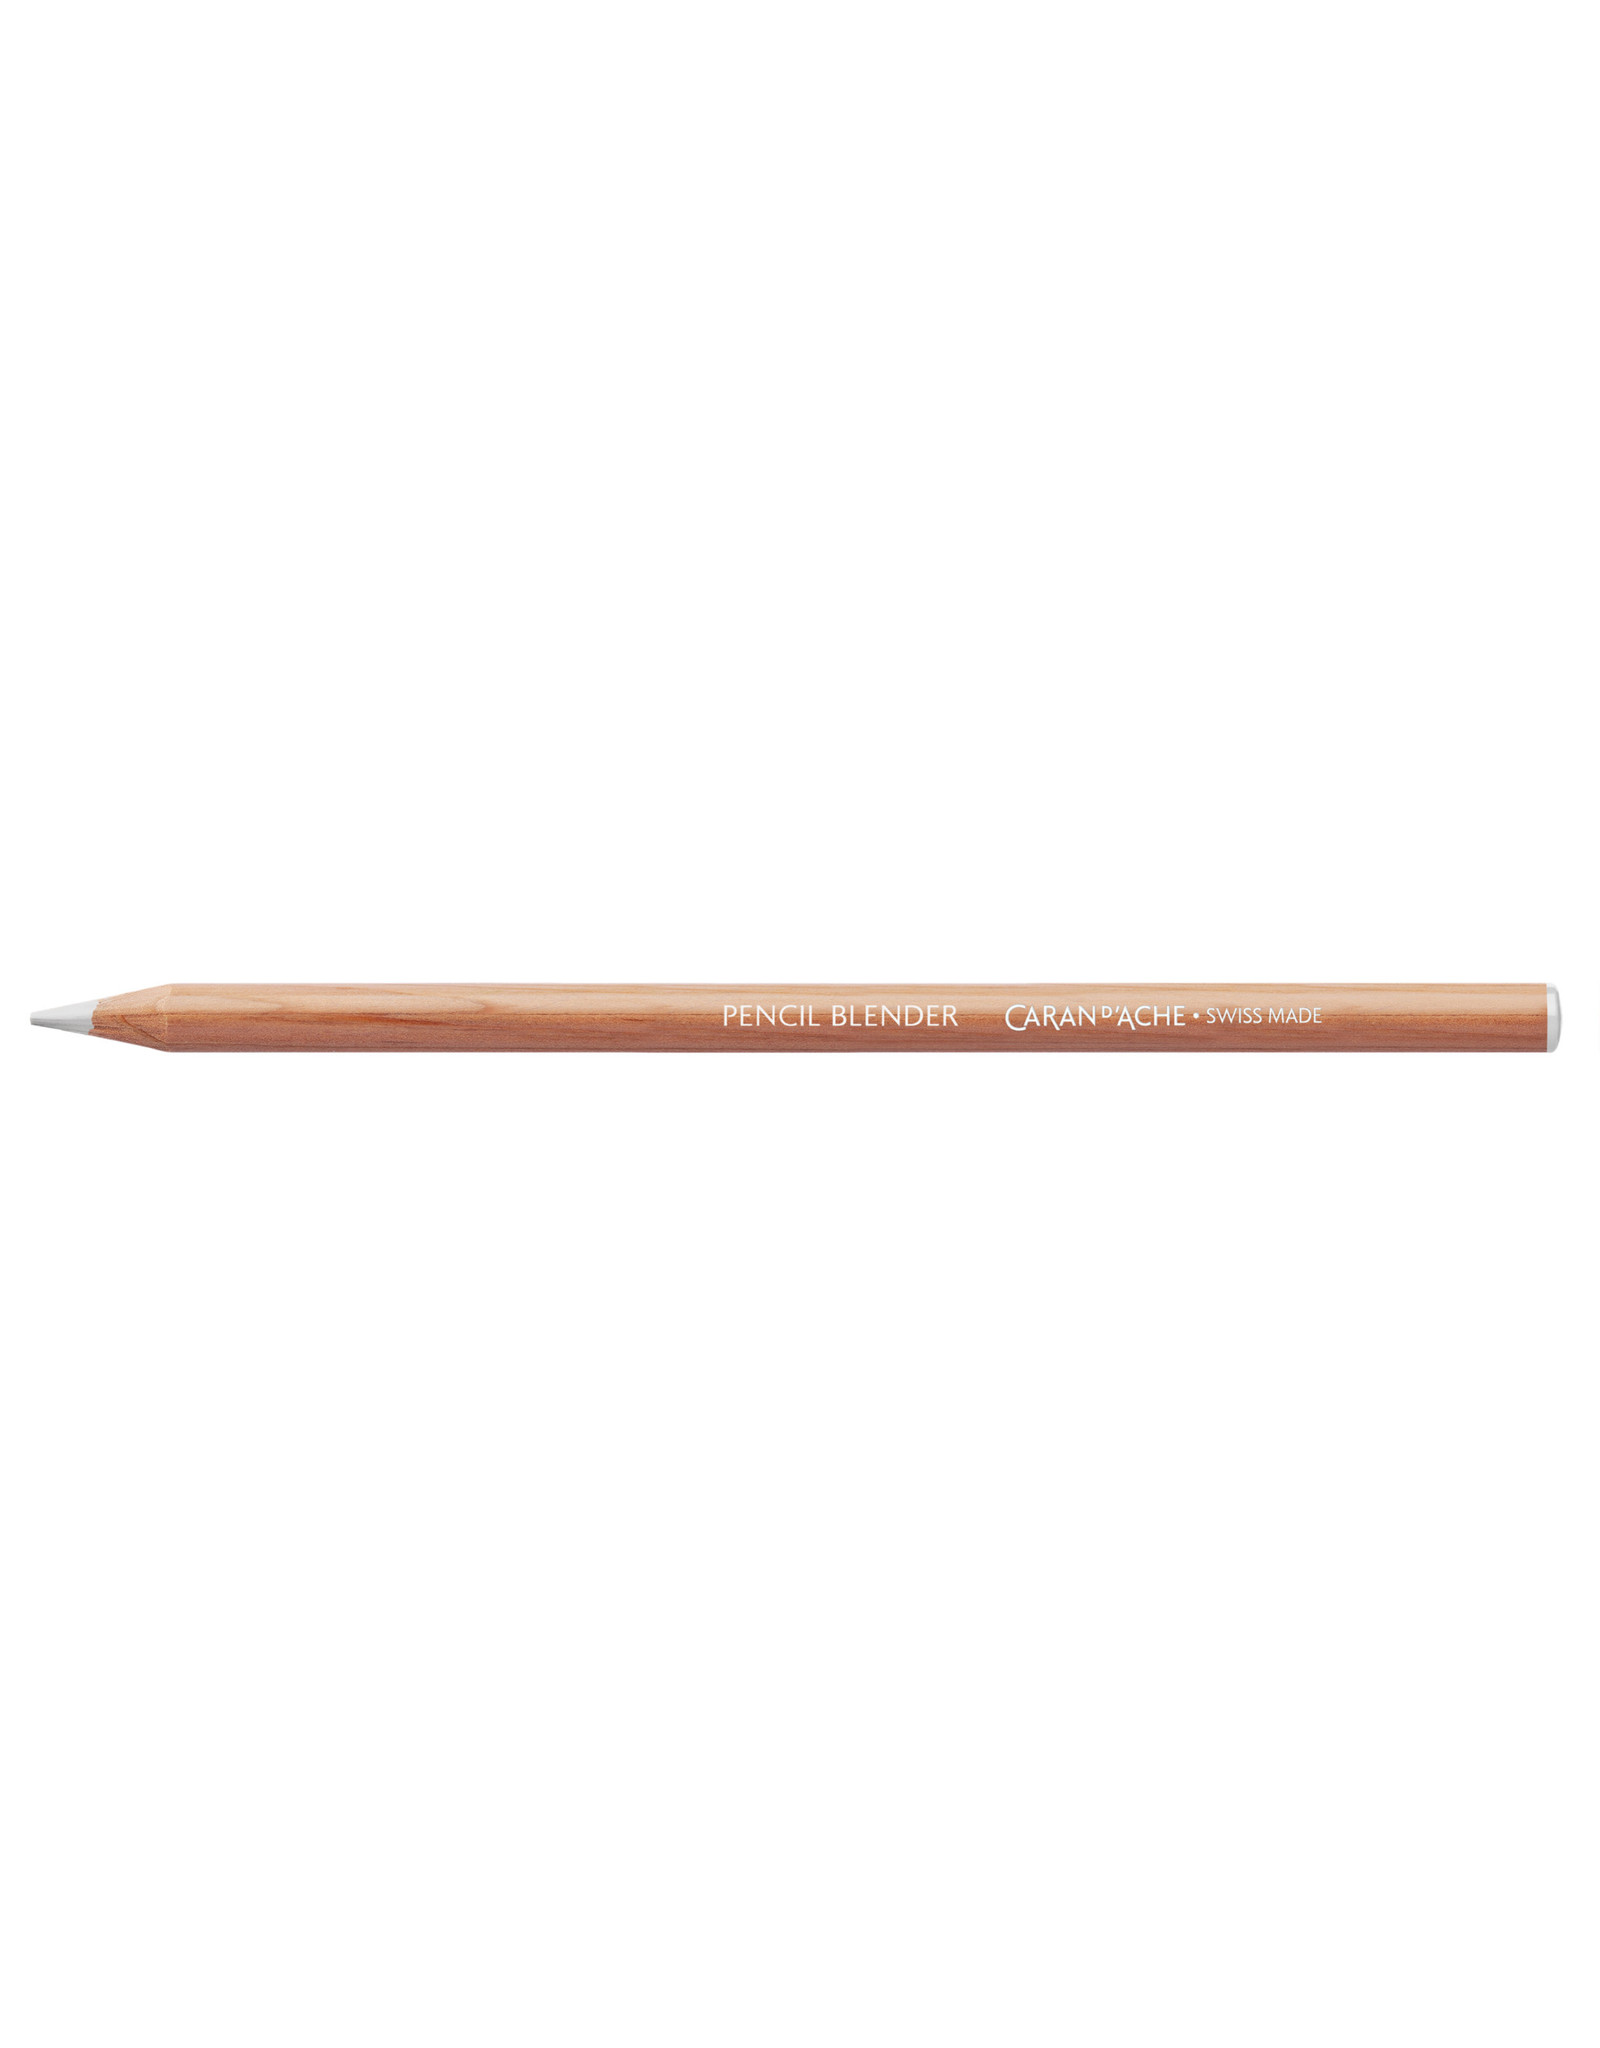 Luminance  pencil blender